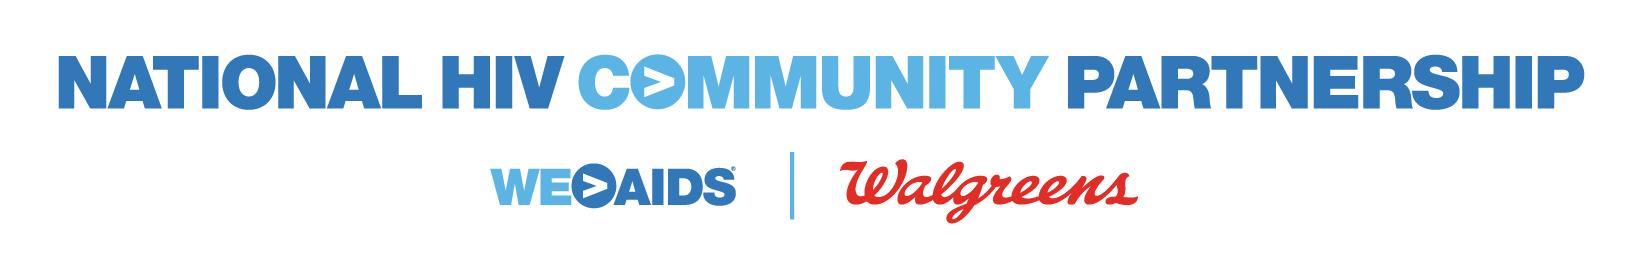 National HIV Community Partnership 5